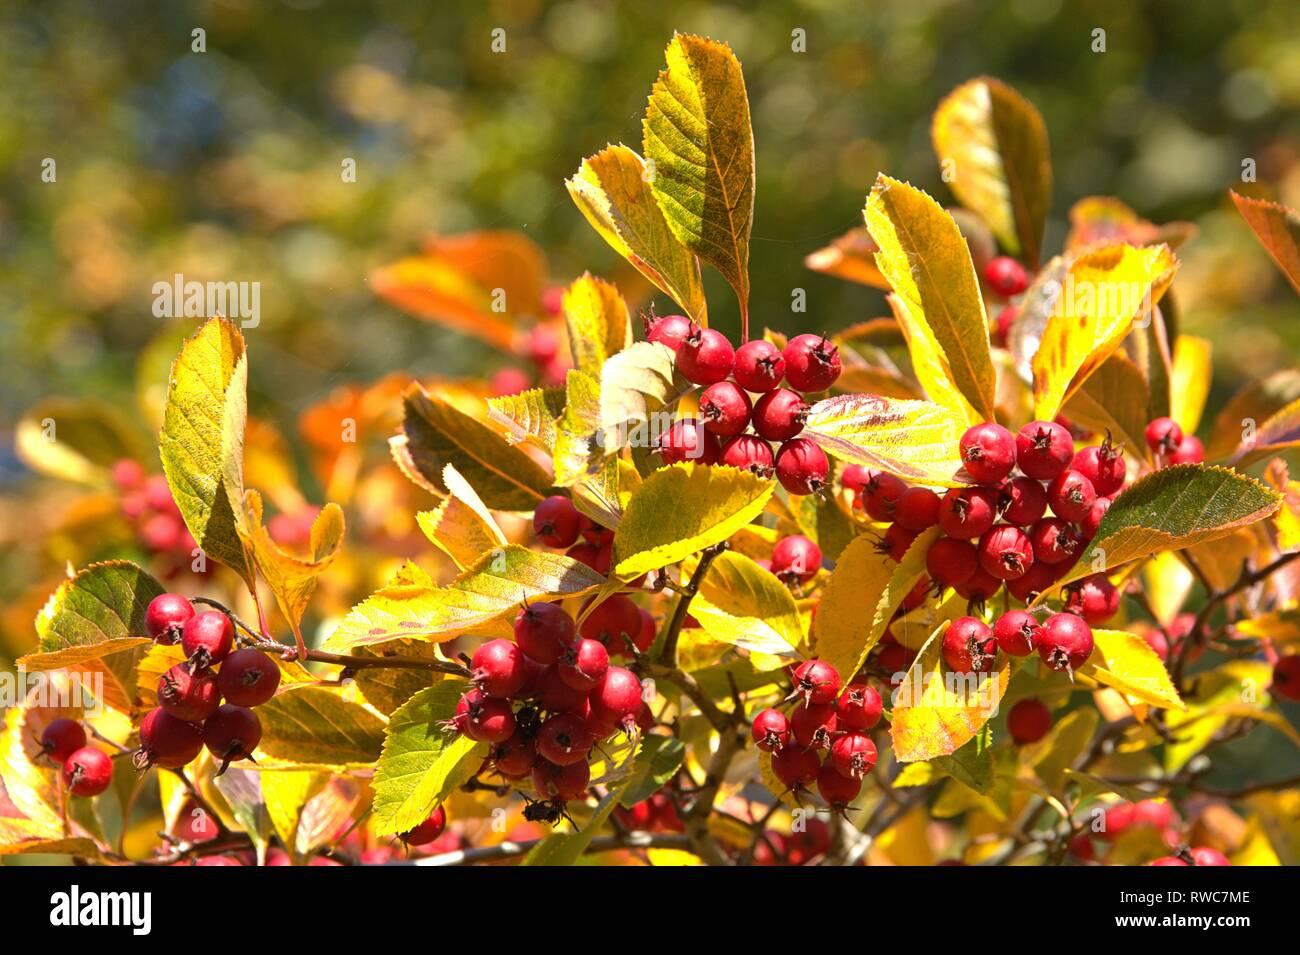 Schleswig, Deutschland. 11th Oct, 2018. Detail of a autumn-colored cockerel hawthorn tree (Crataegus crus-galli) in Schleswig. Family: rose plants (Rosaceae), subfamily: Spiraeoideae, tribe: pyreae, sub-tribe: pome fruit (Pyrinae), genus: hawthorn (Crataegus), species: hawthorn hawthorn   usage worldwide Credit: dpa/Alamy Live News Stock Photo